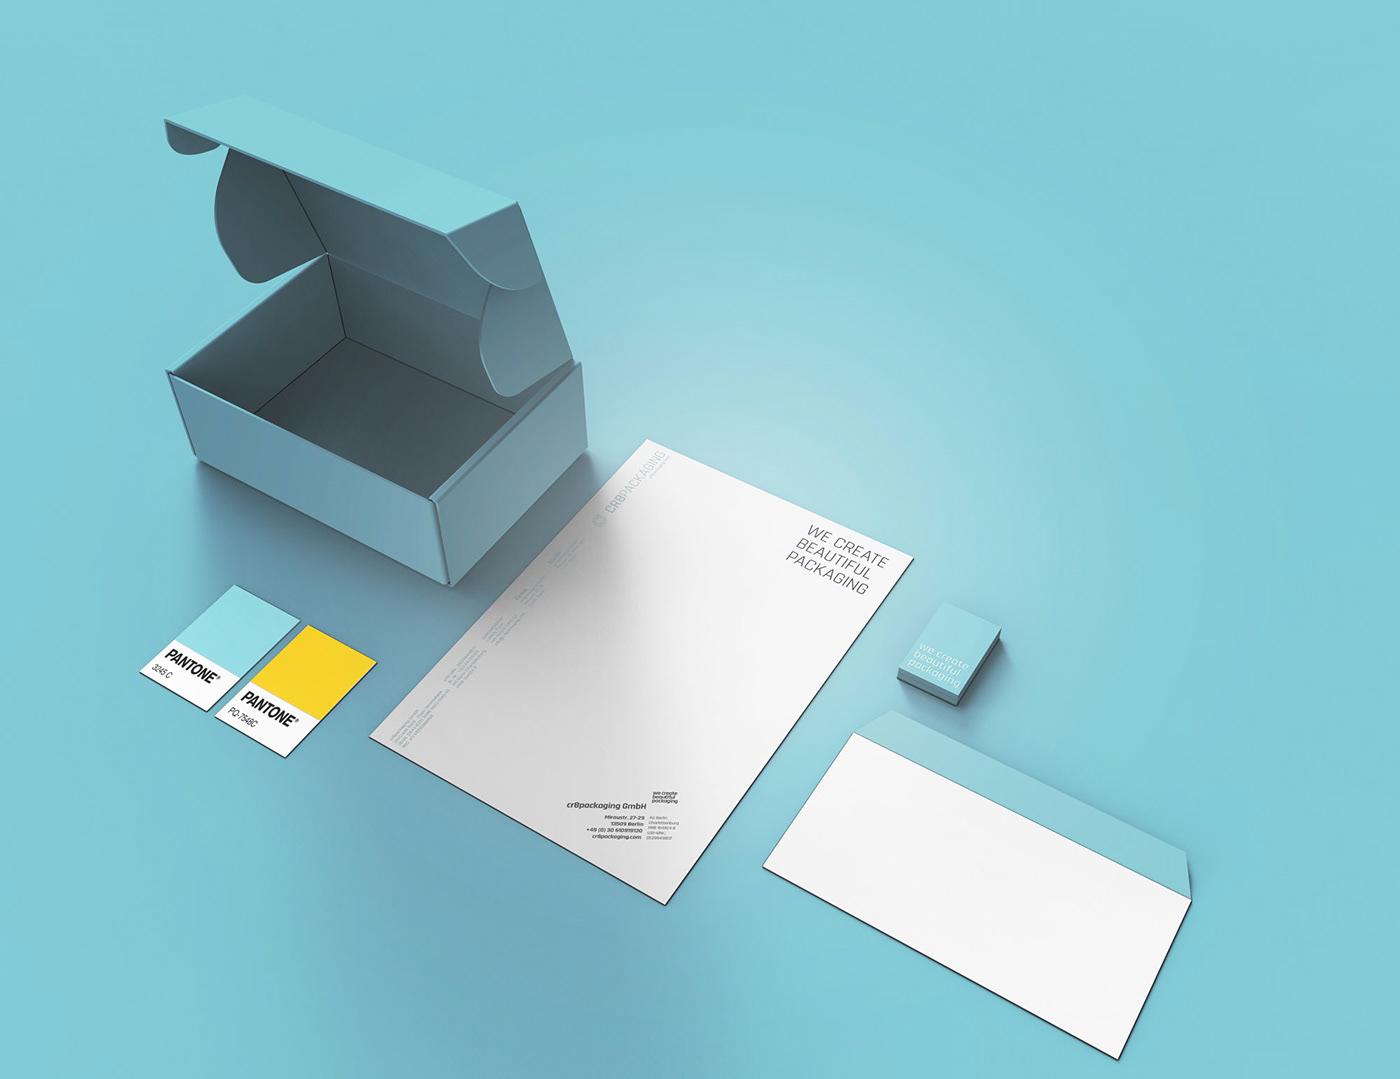 Image may contain: envelope and screenshot